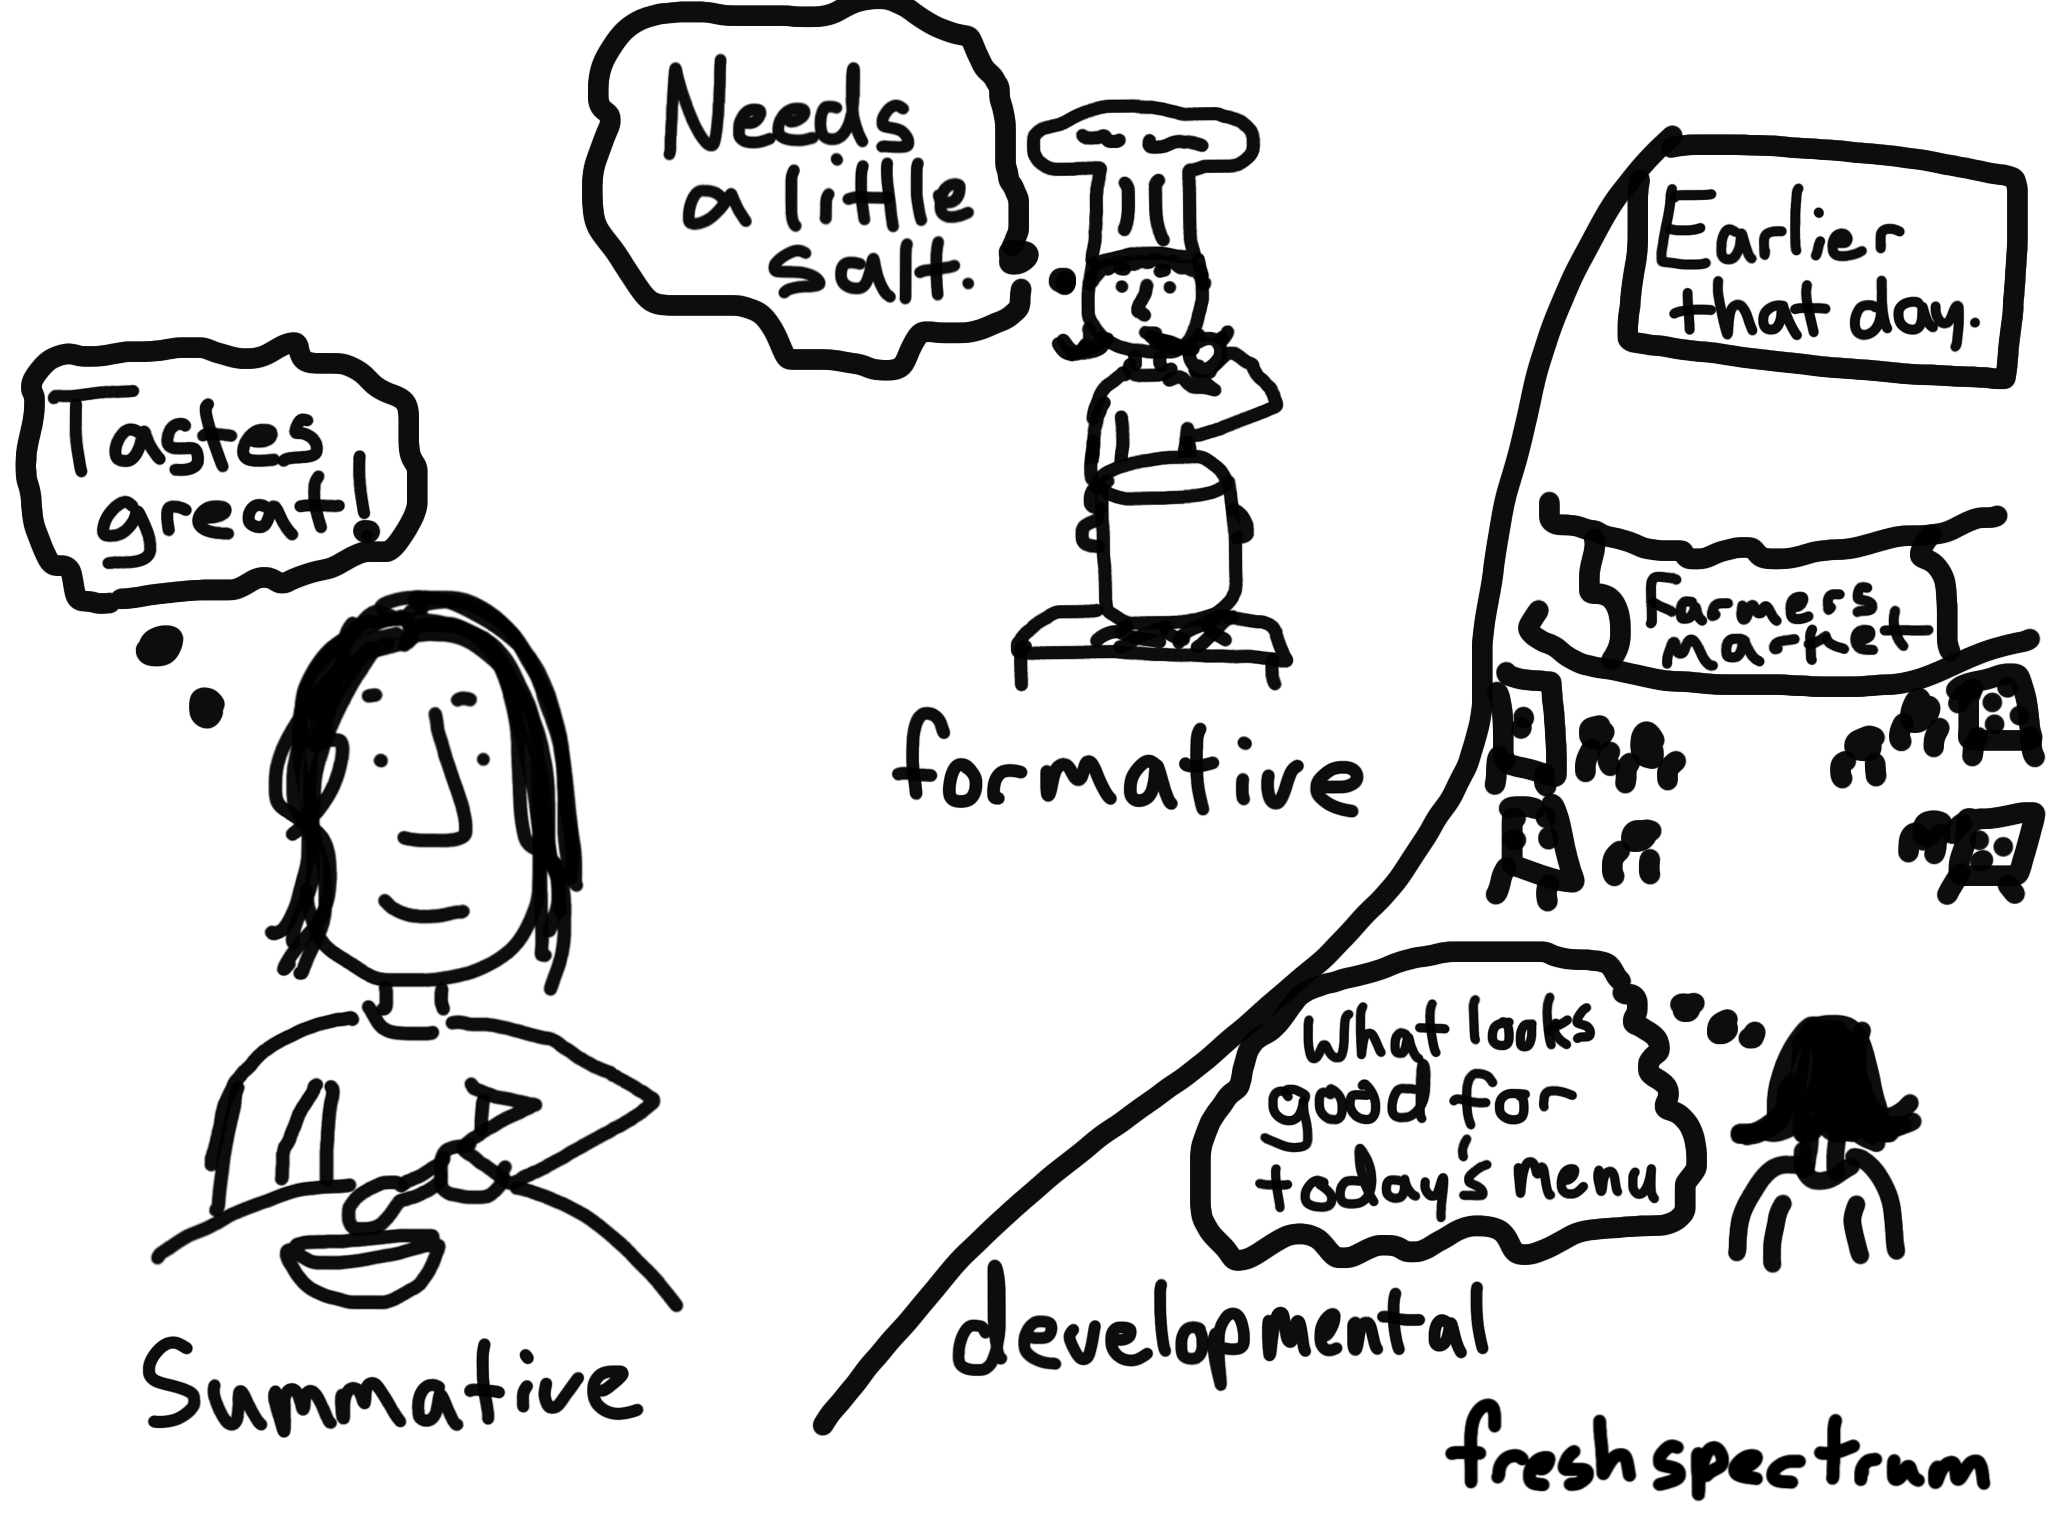 Summative, Formative and Developmental